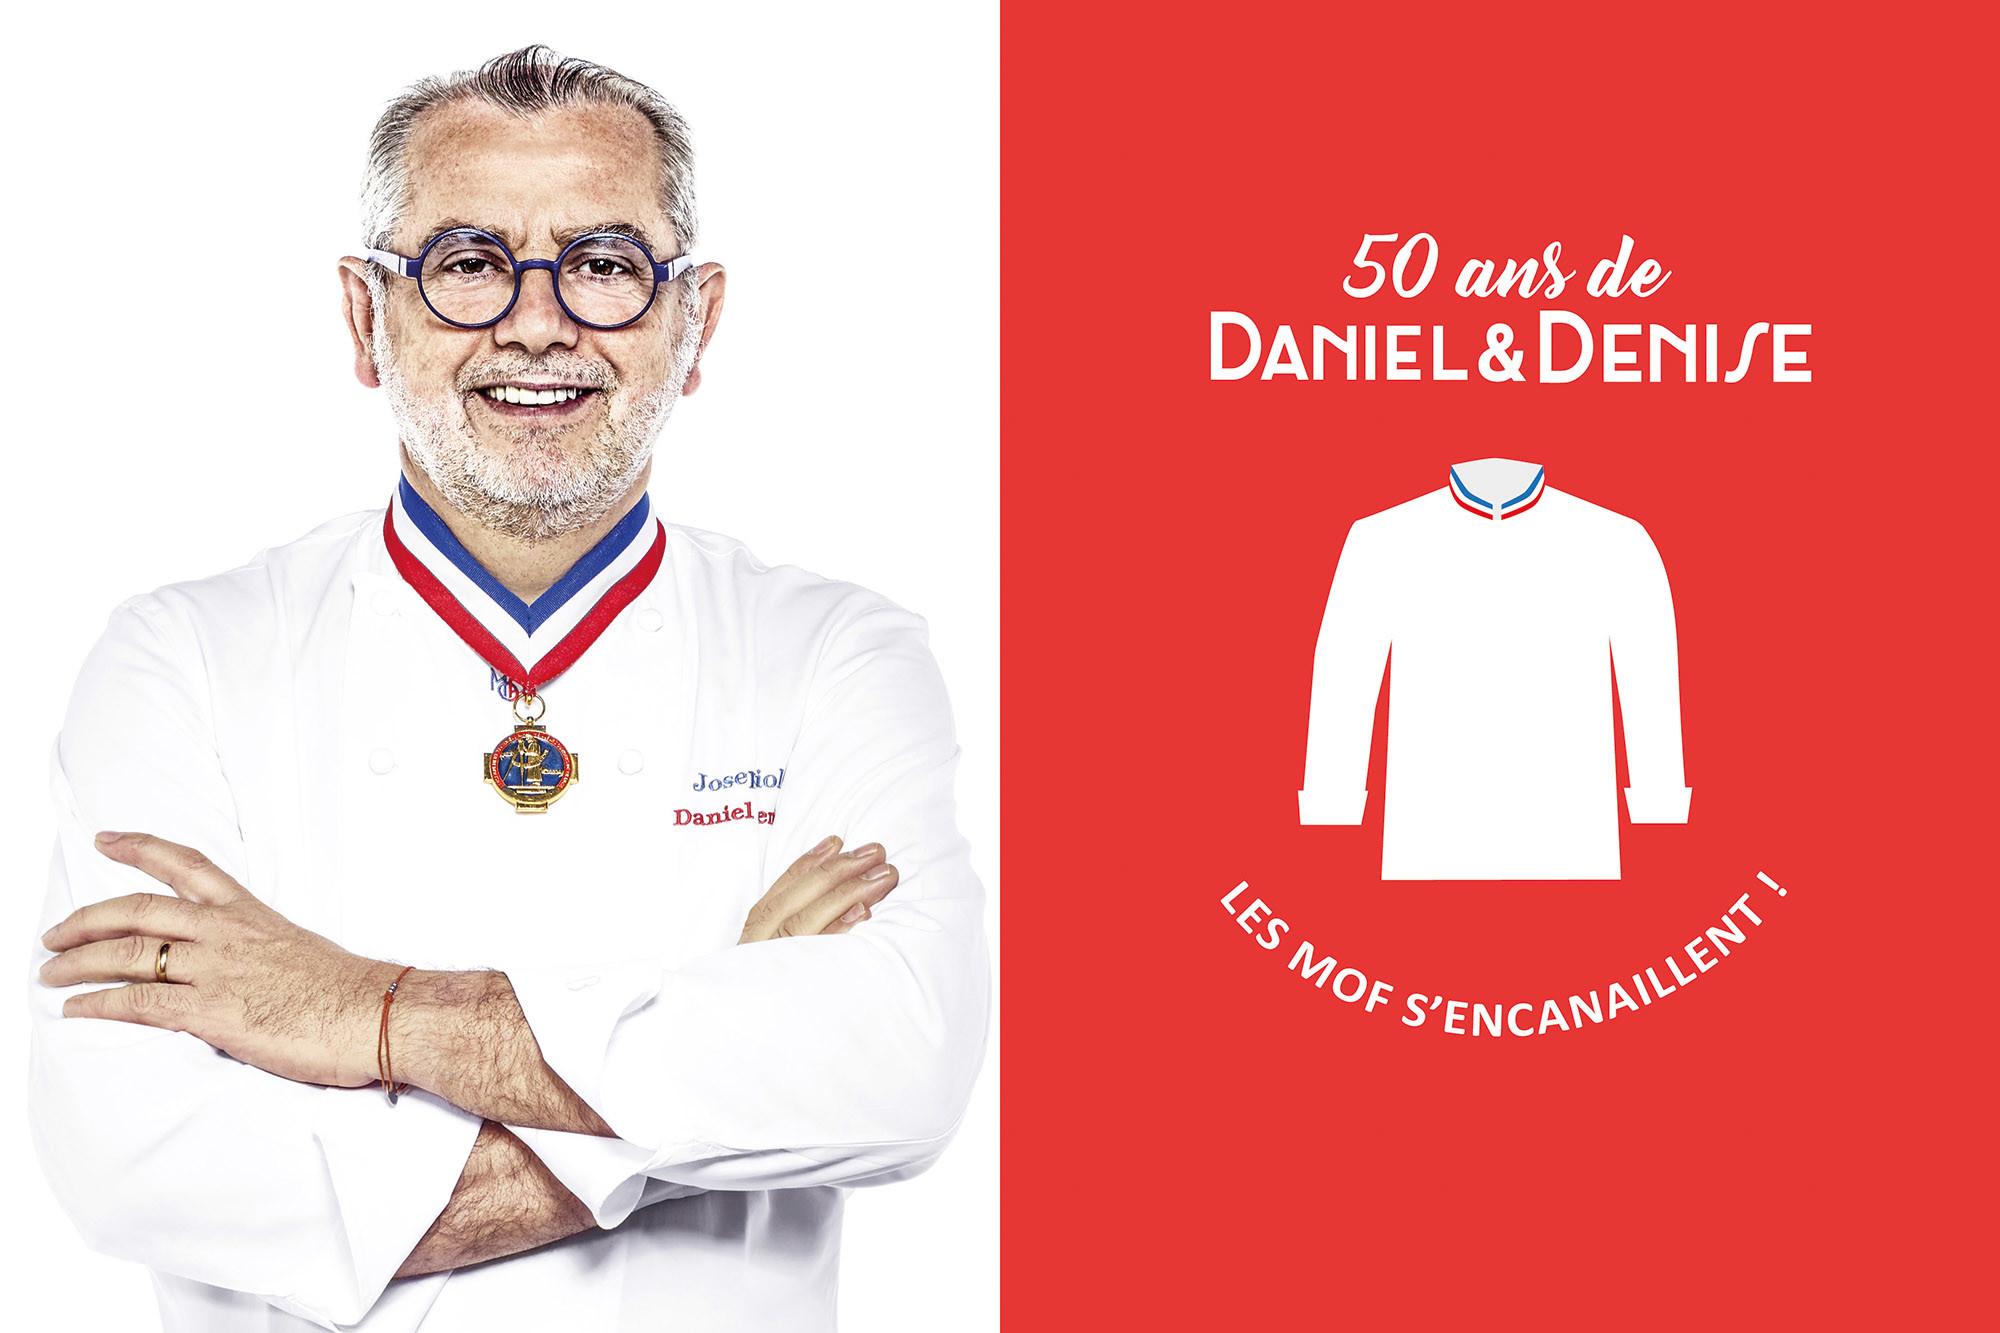 50 ans Daniel & Denise Joseph Viola MOF